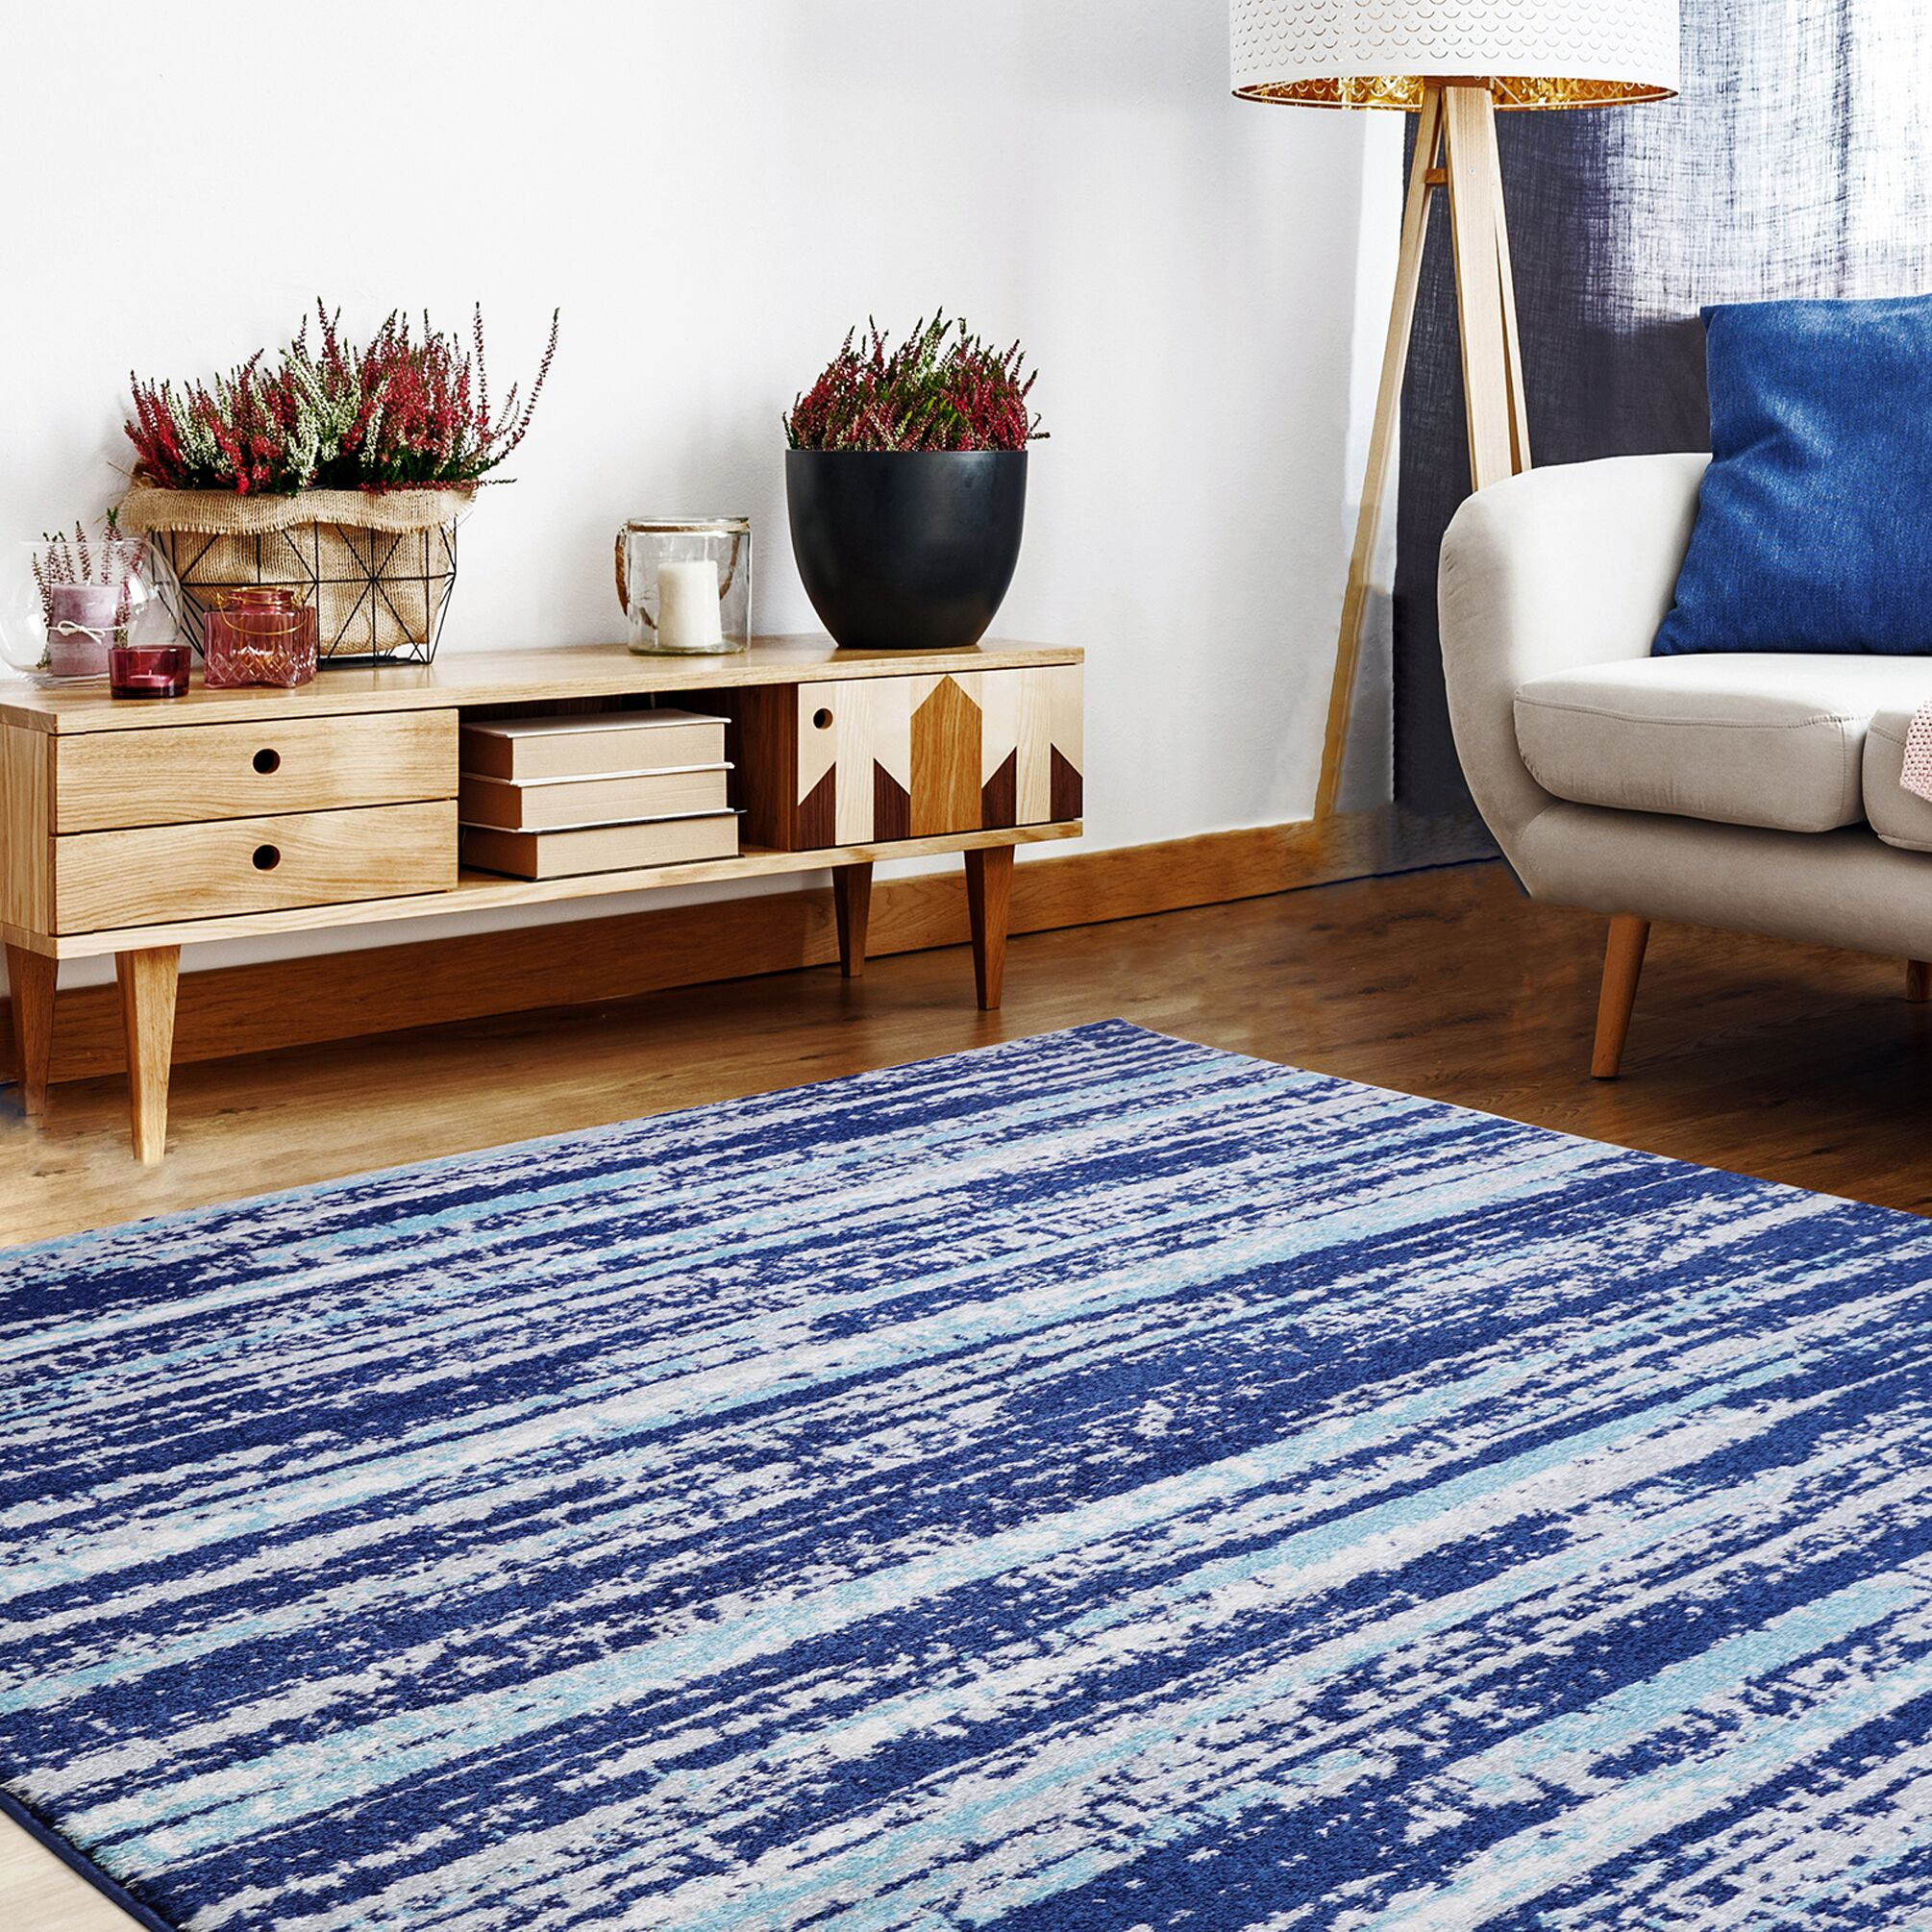 Bravo Blue Area Rug Rug Size: Rectangle 5'3'' x 7'10''